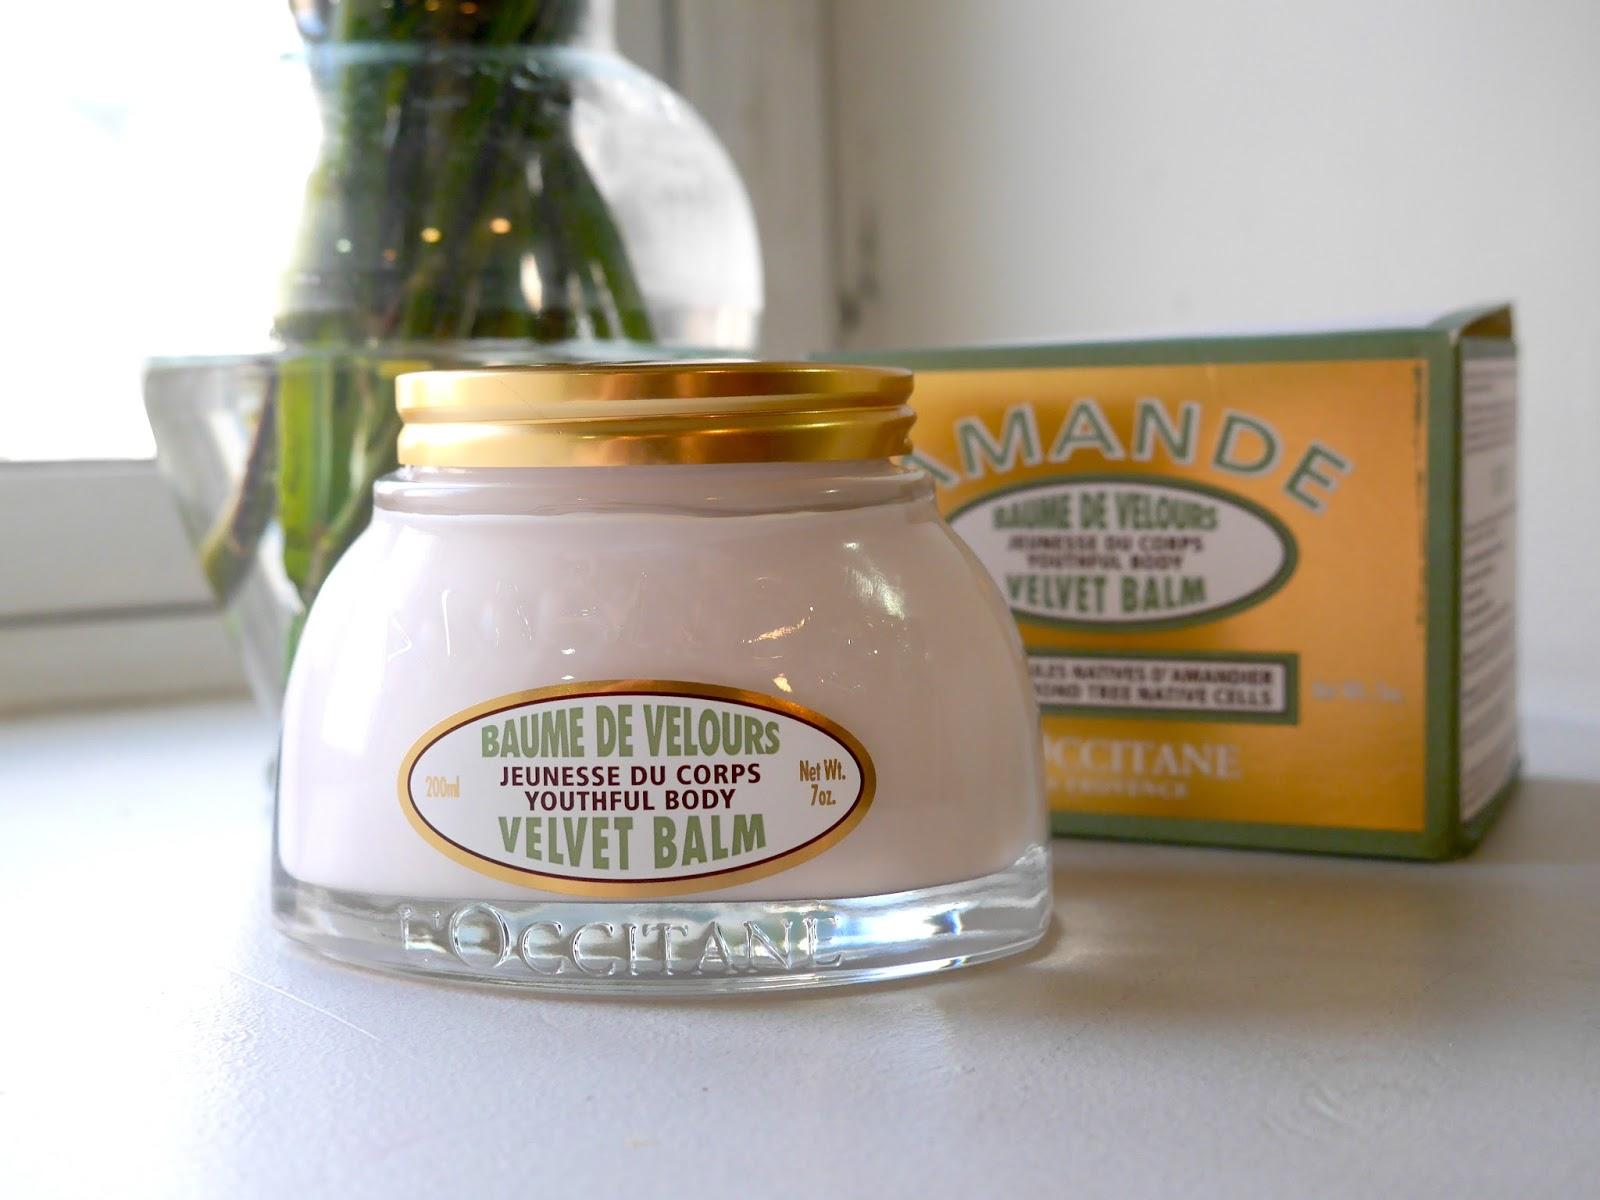 review of L'occitane's almond velvet balm amande baume de velours